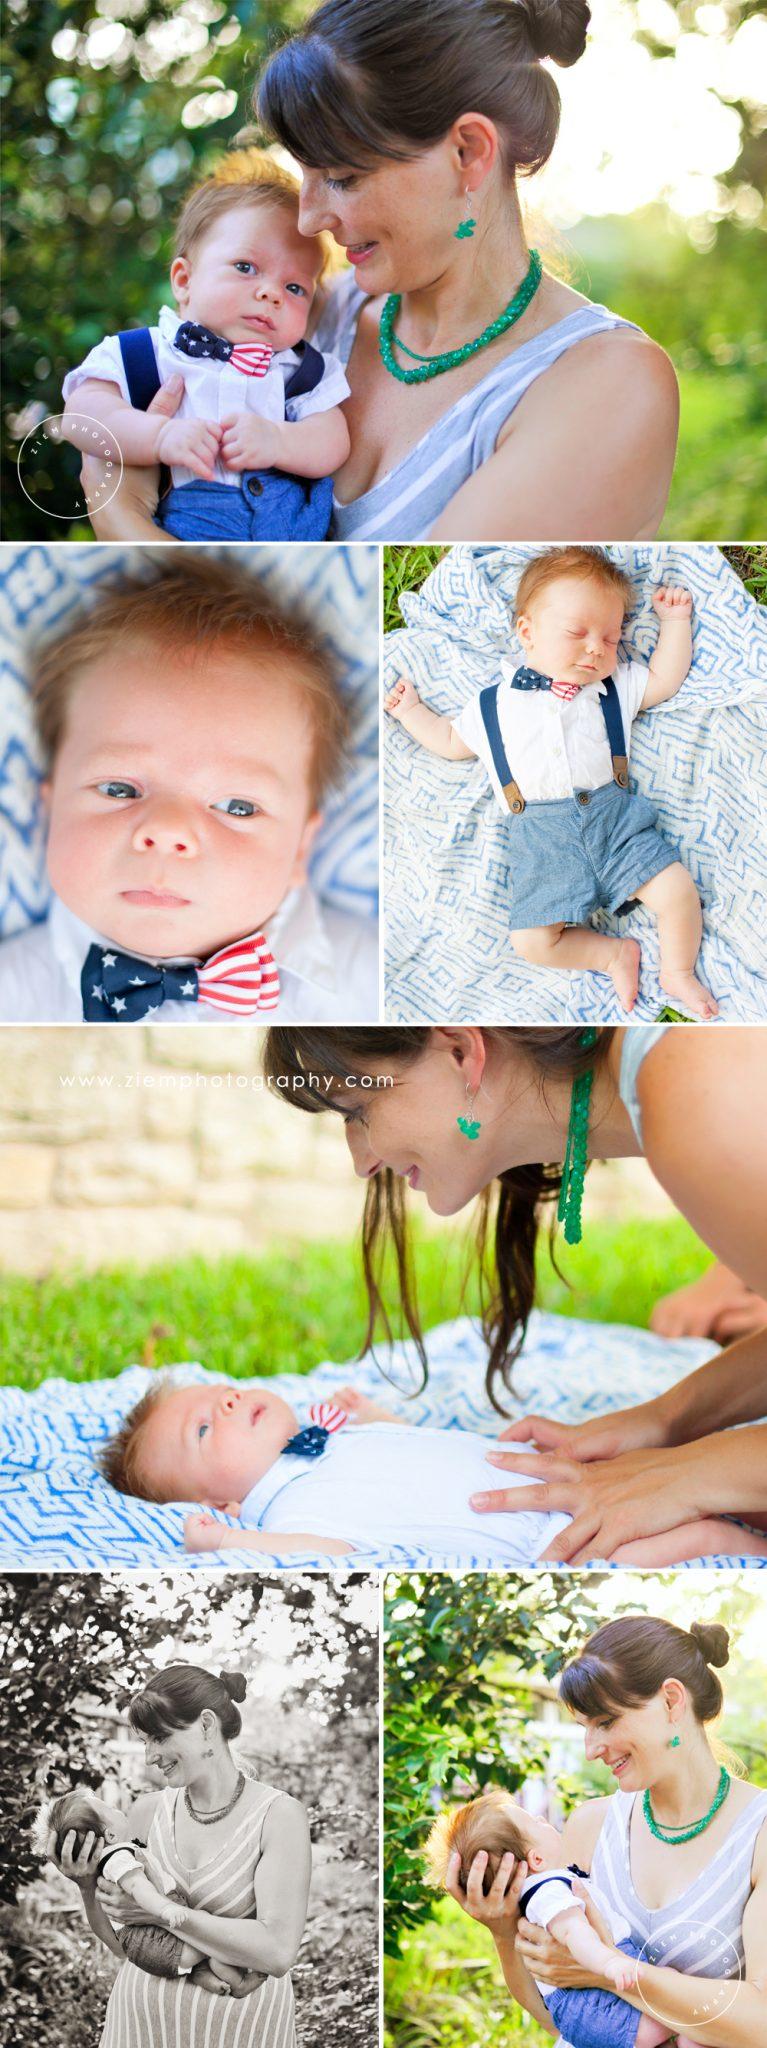 FamilyPhotography Austin Newborn Lifestyle Photographers Ziem